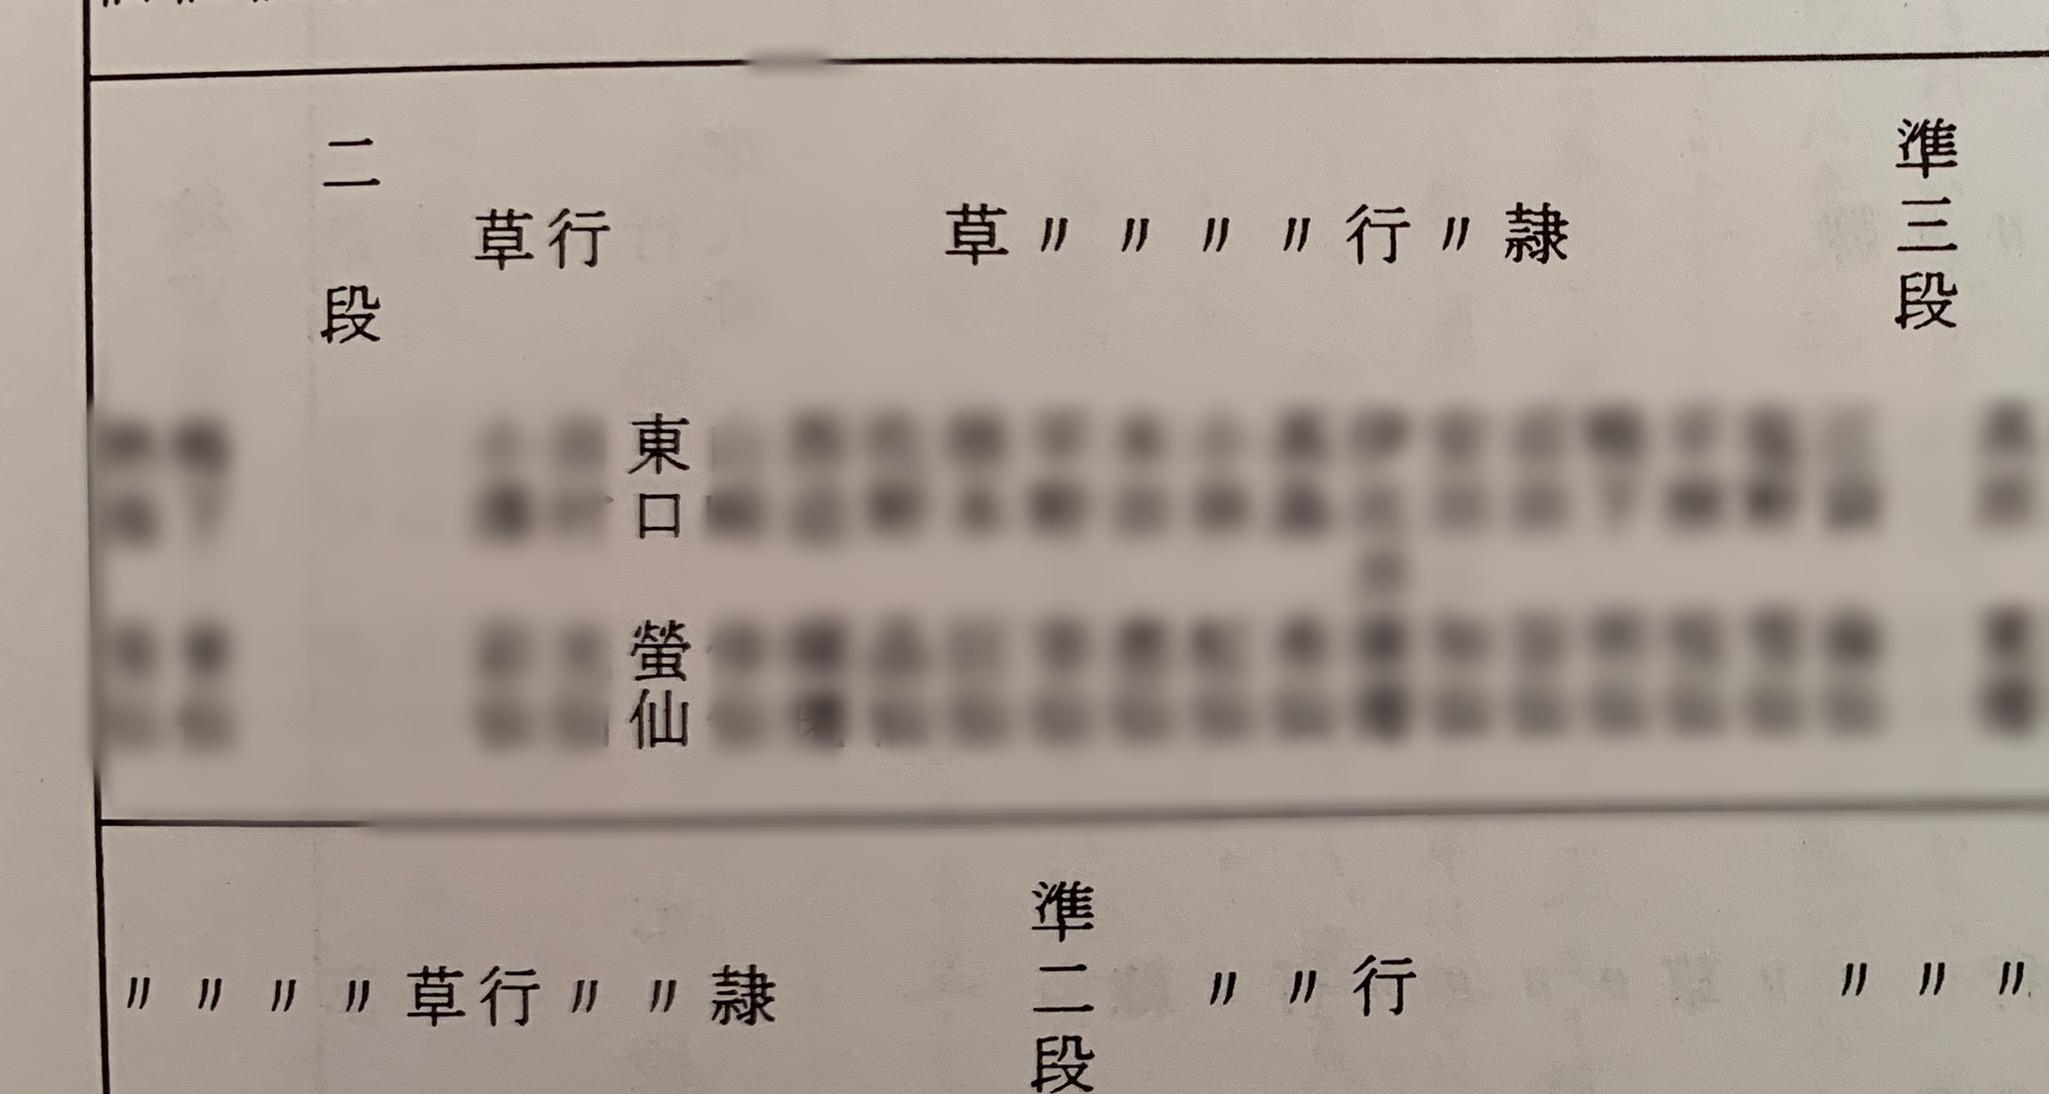 4C568760-6FAC-4096-AD2D-04FA0CDF15FE.JPG